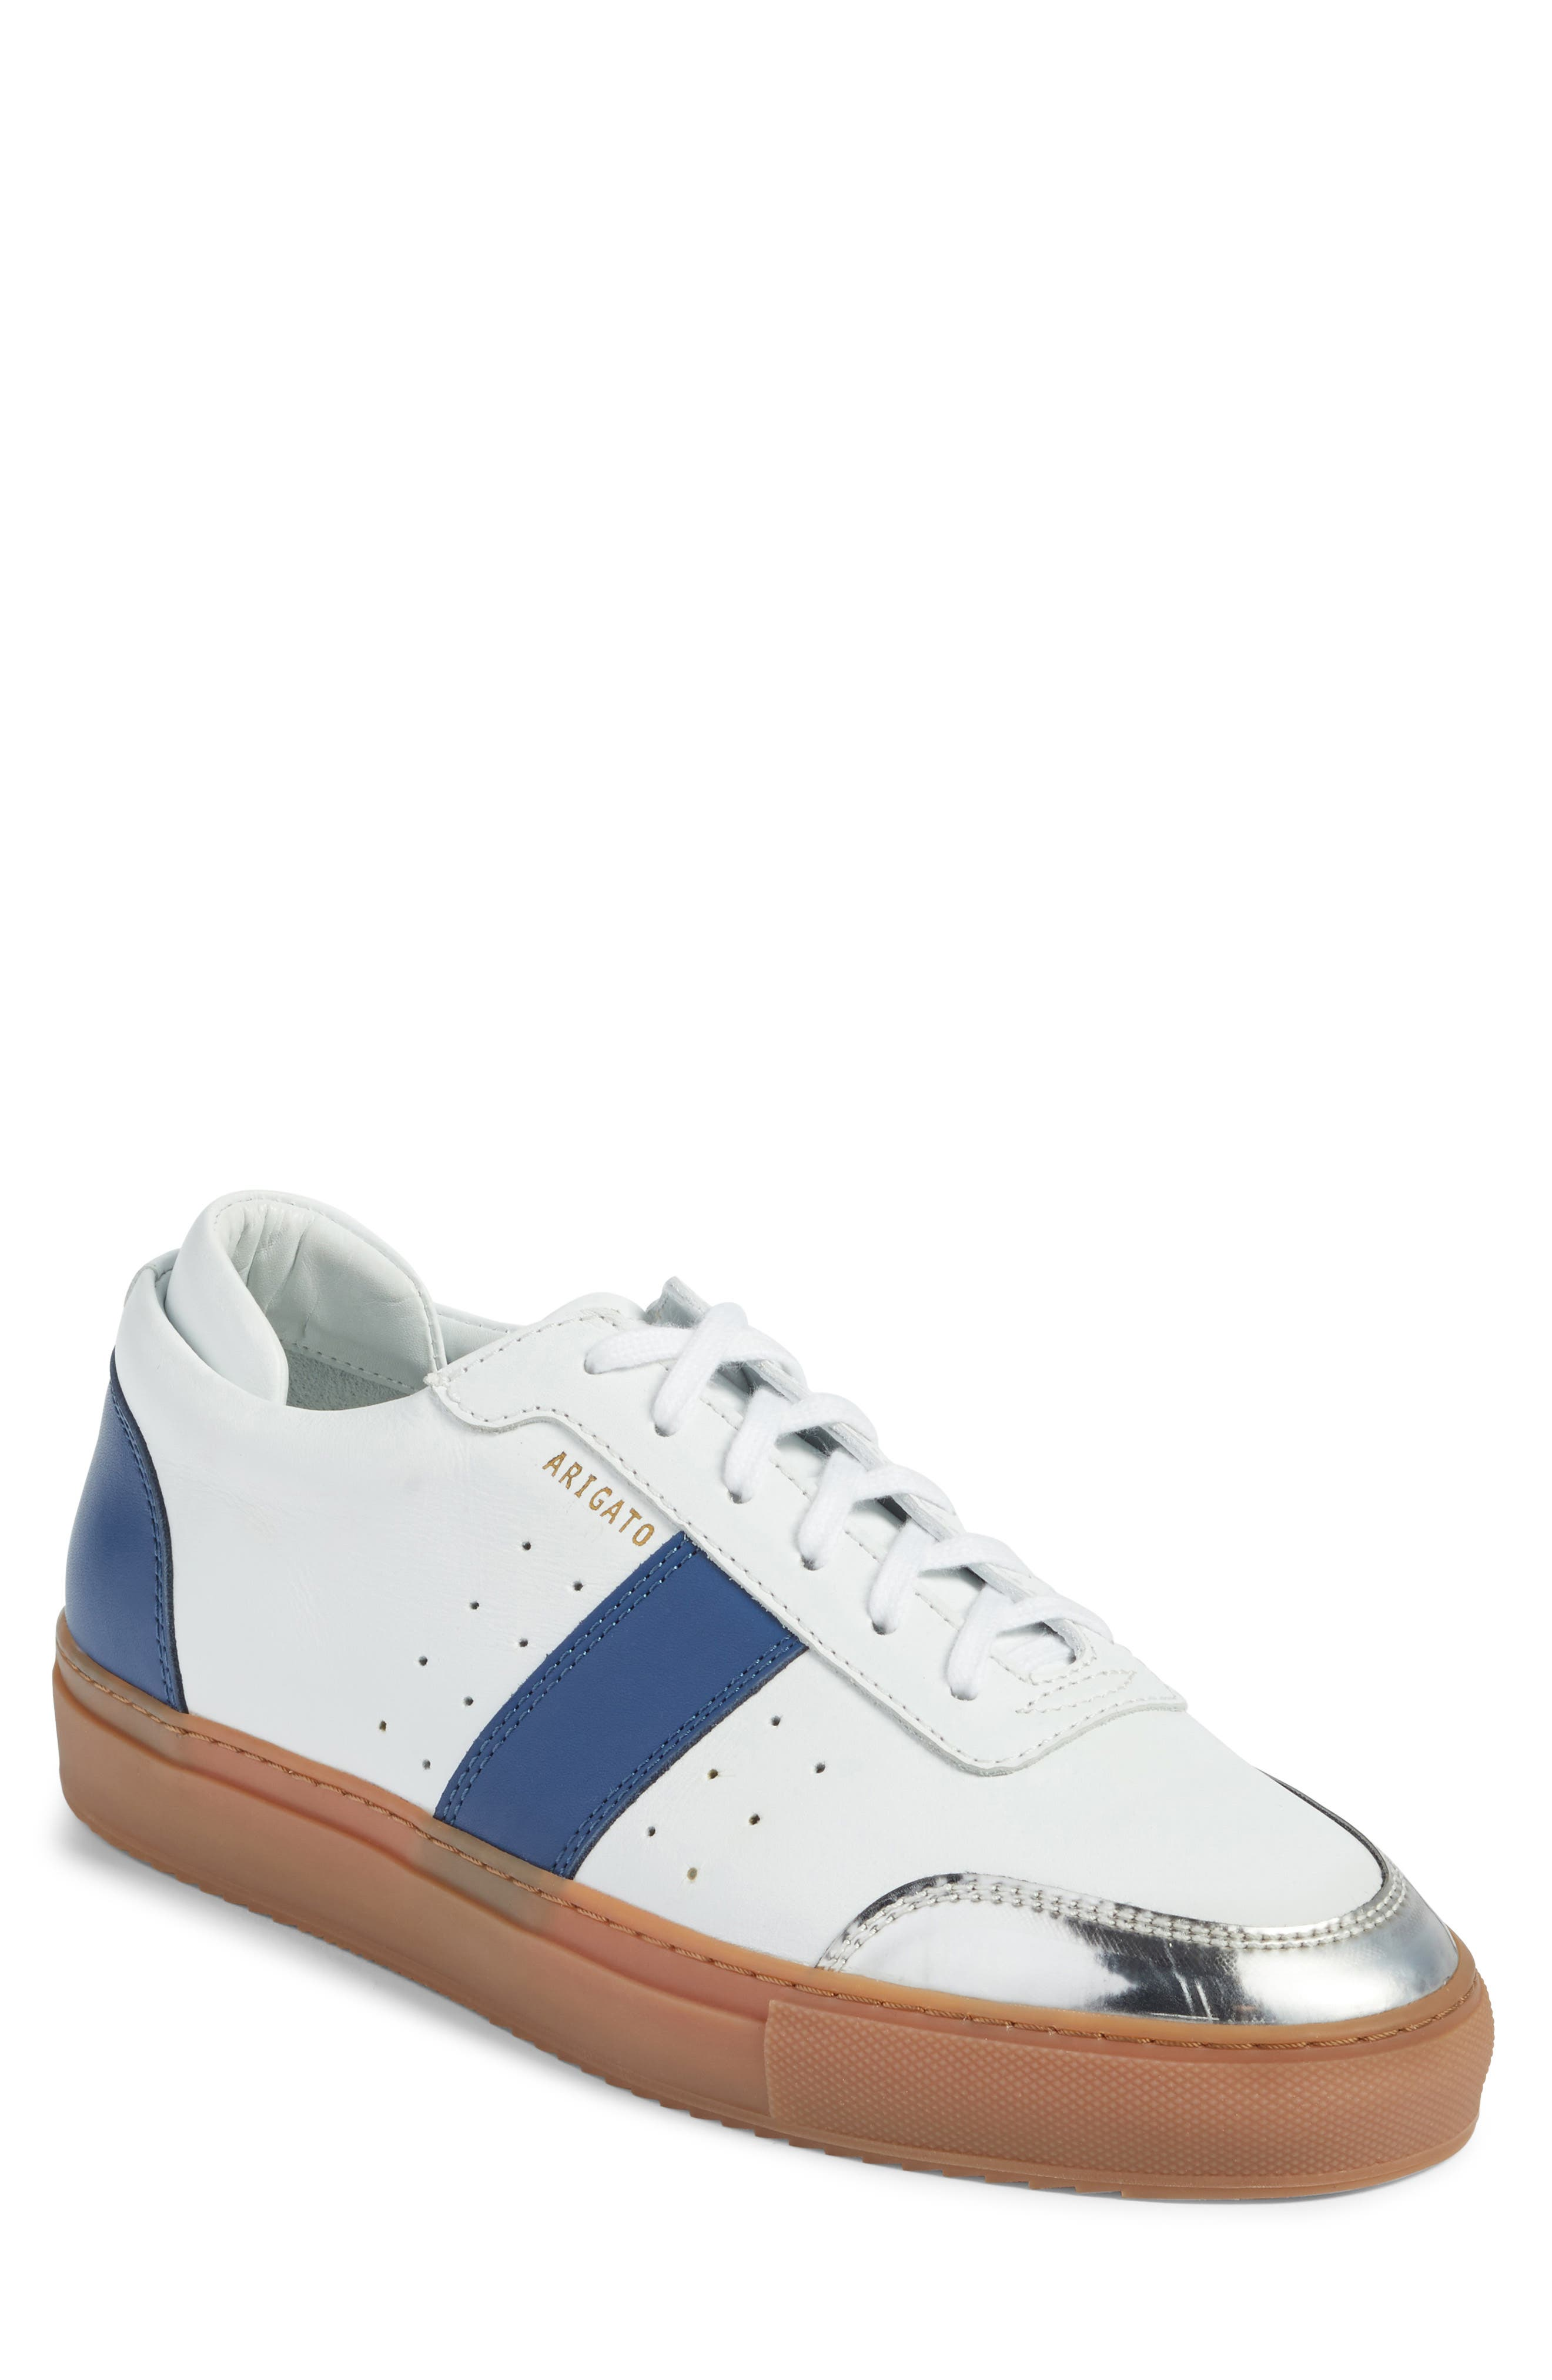 Dunk Sneaker,                         Main,                         color, White/ Navy